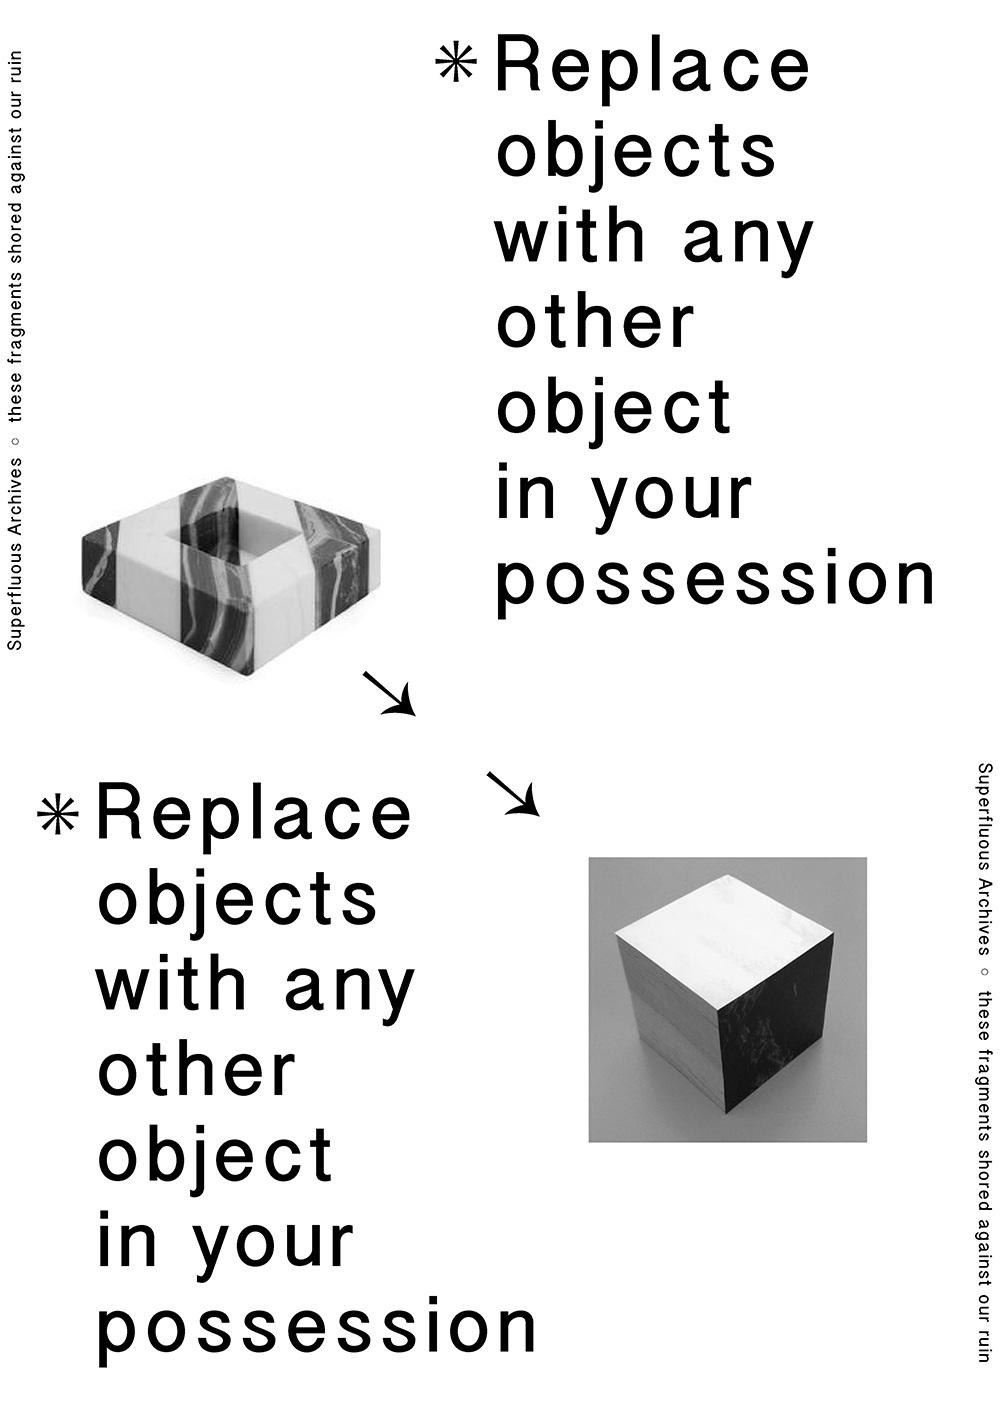 A1_replace_sorthvid_1000.jpg